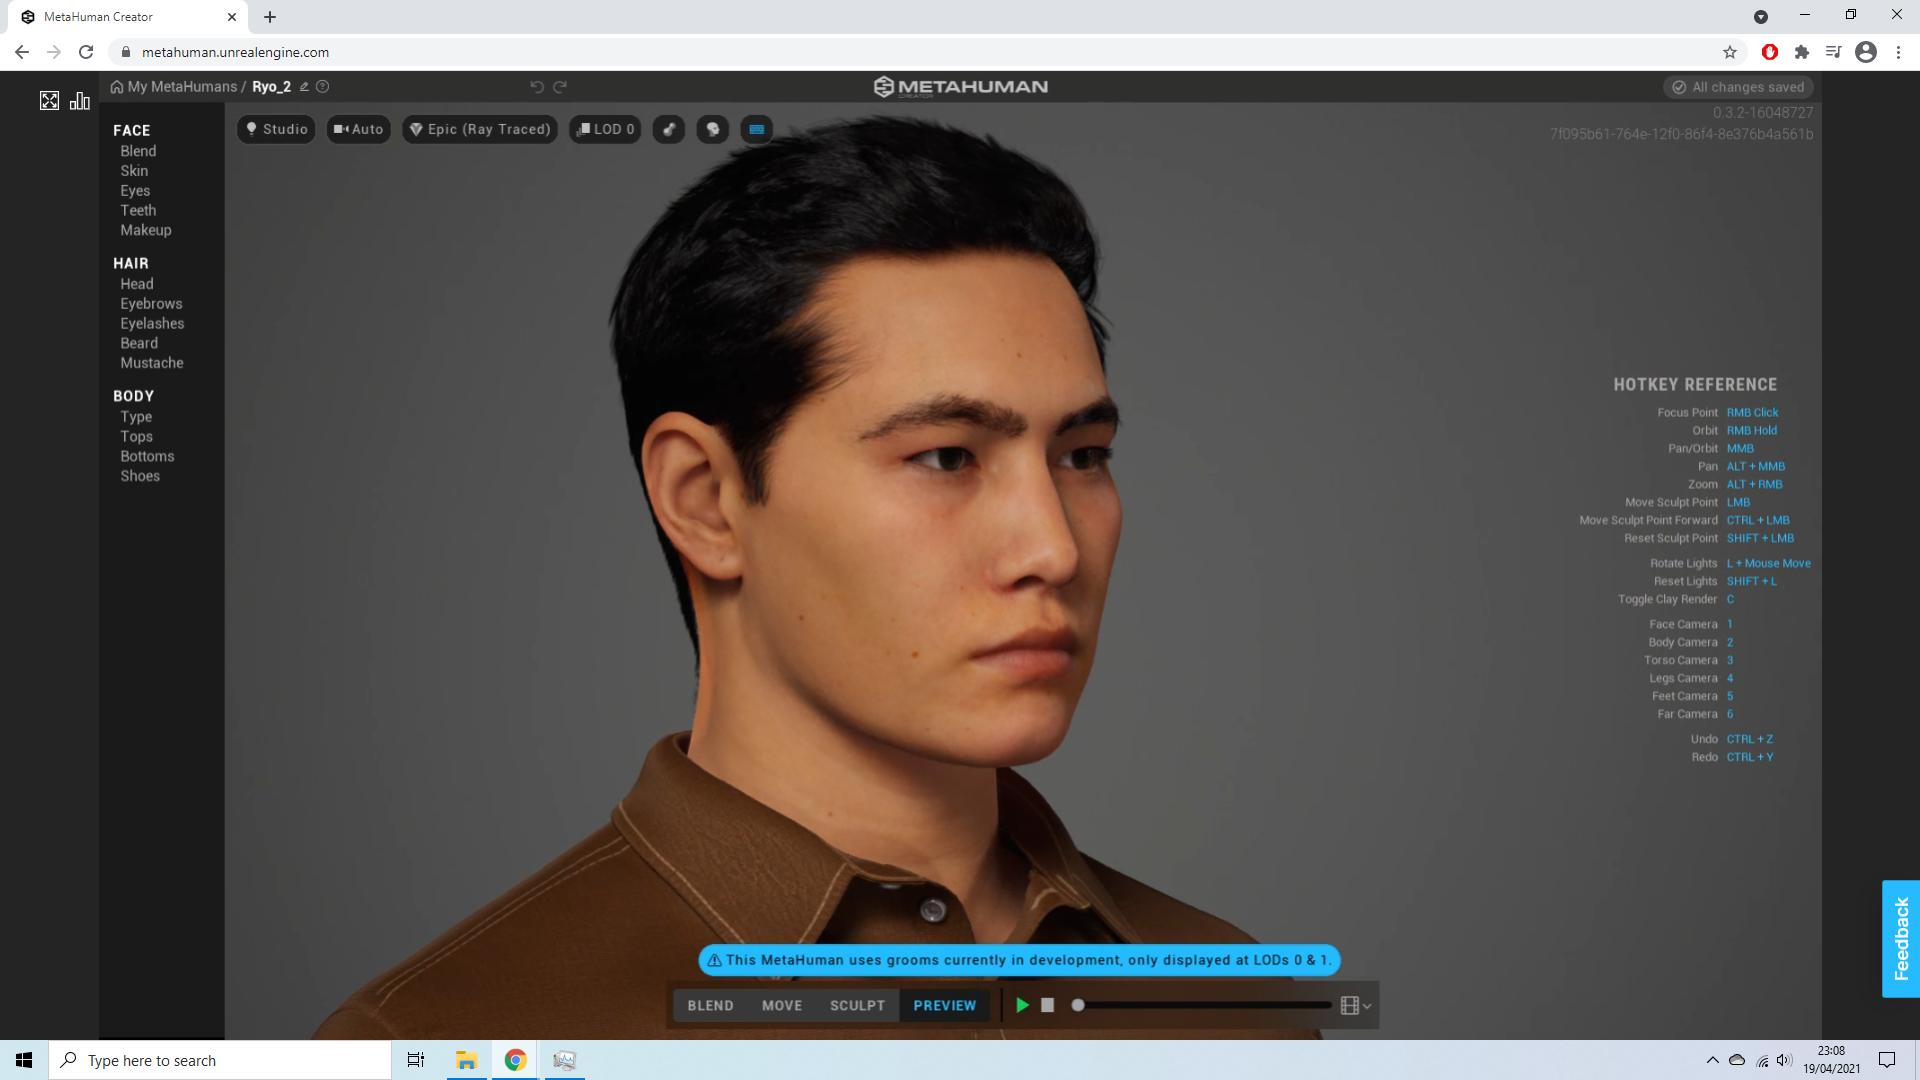 desktopscreenshot20210ljff.png